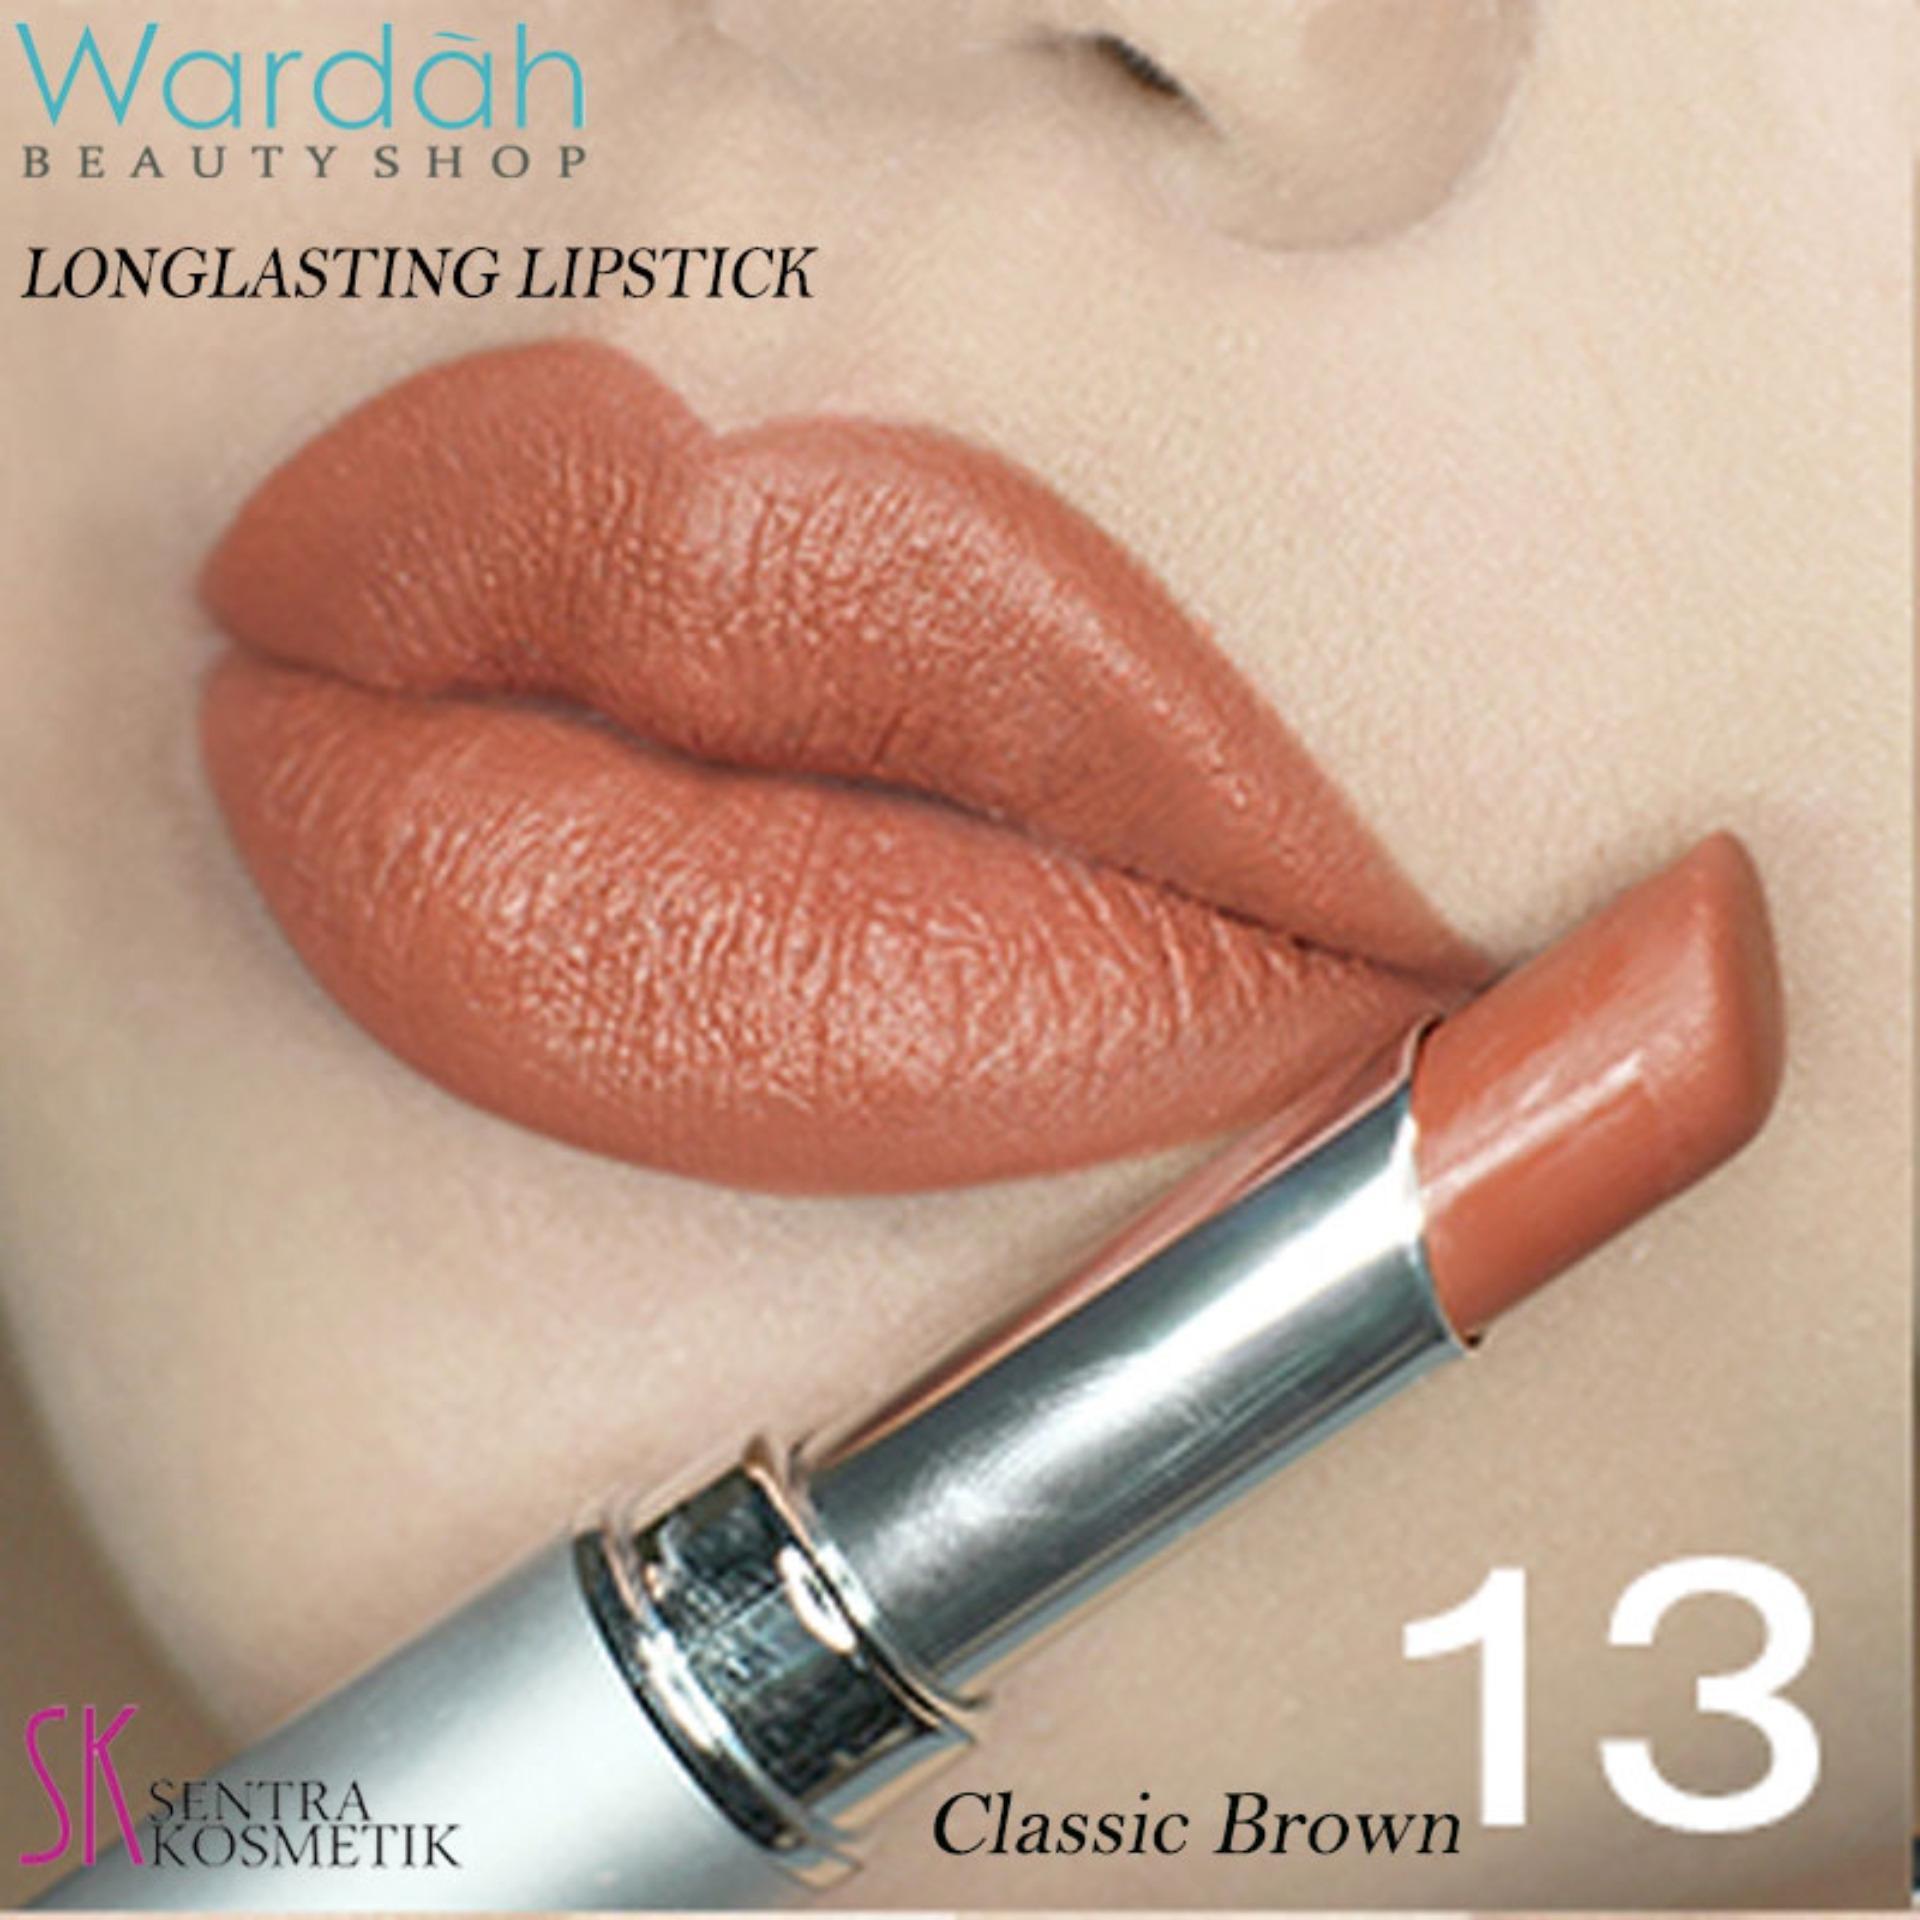 Wardah Matte Lipstick 08 Brown dan 20 Nuddish Peach Daftar Update Source 01